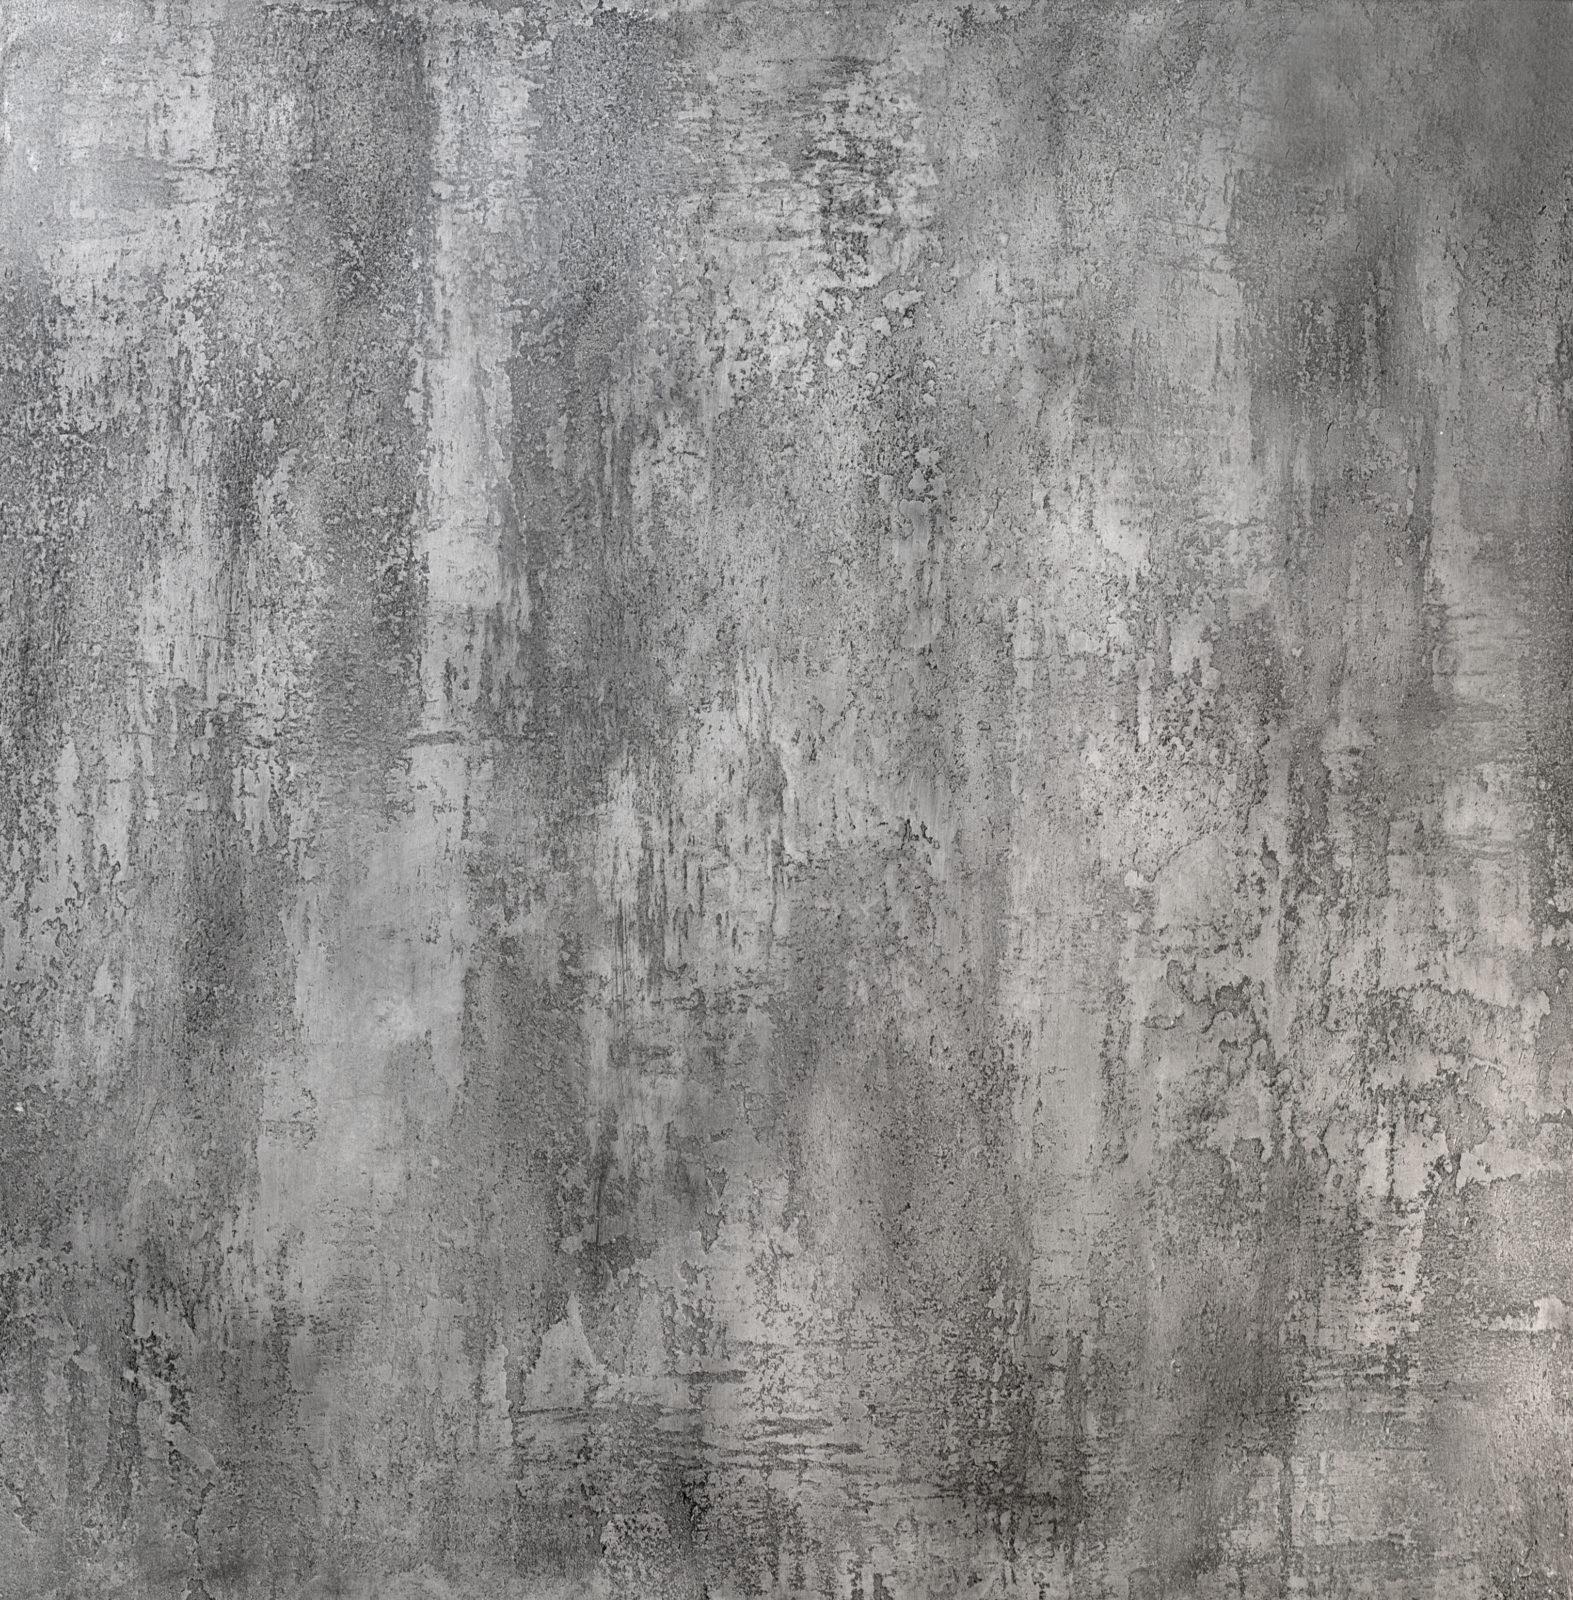 АРТ бетон из декоративной штукатурки